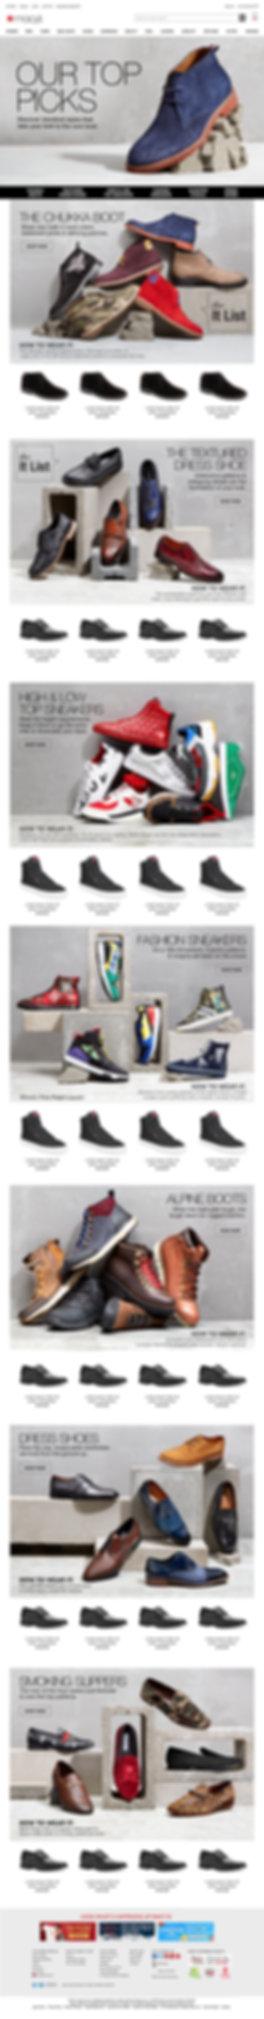 Mens_Shoe_Trend_18_dt1.jpg